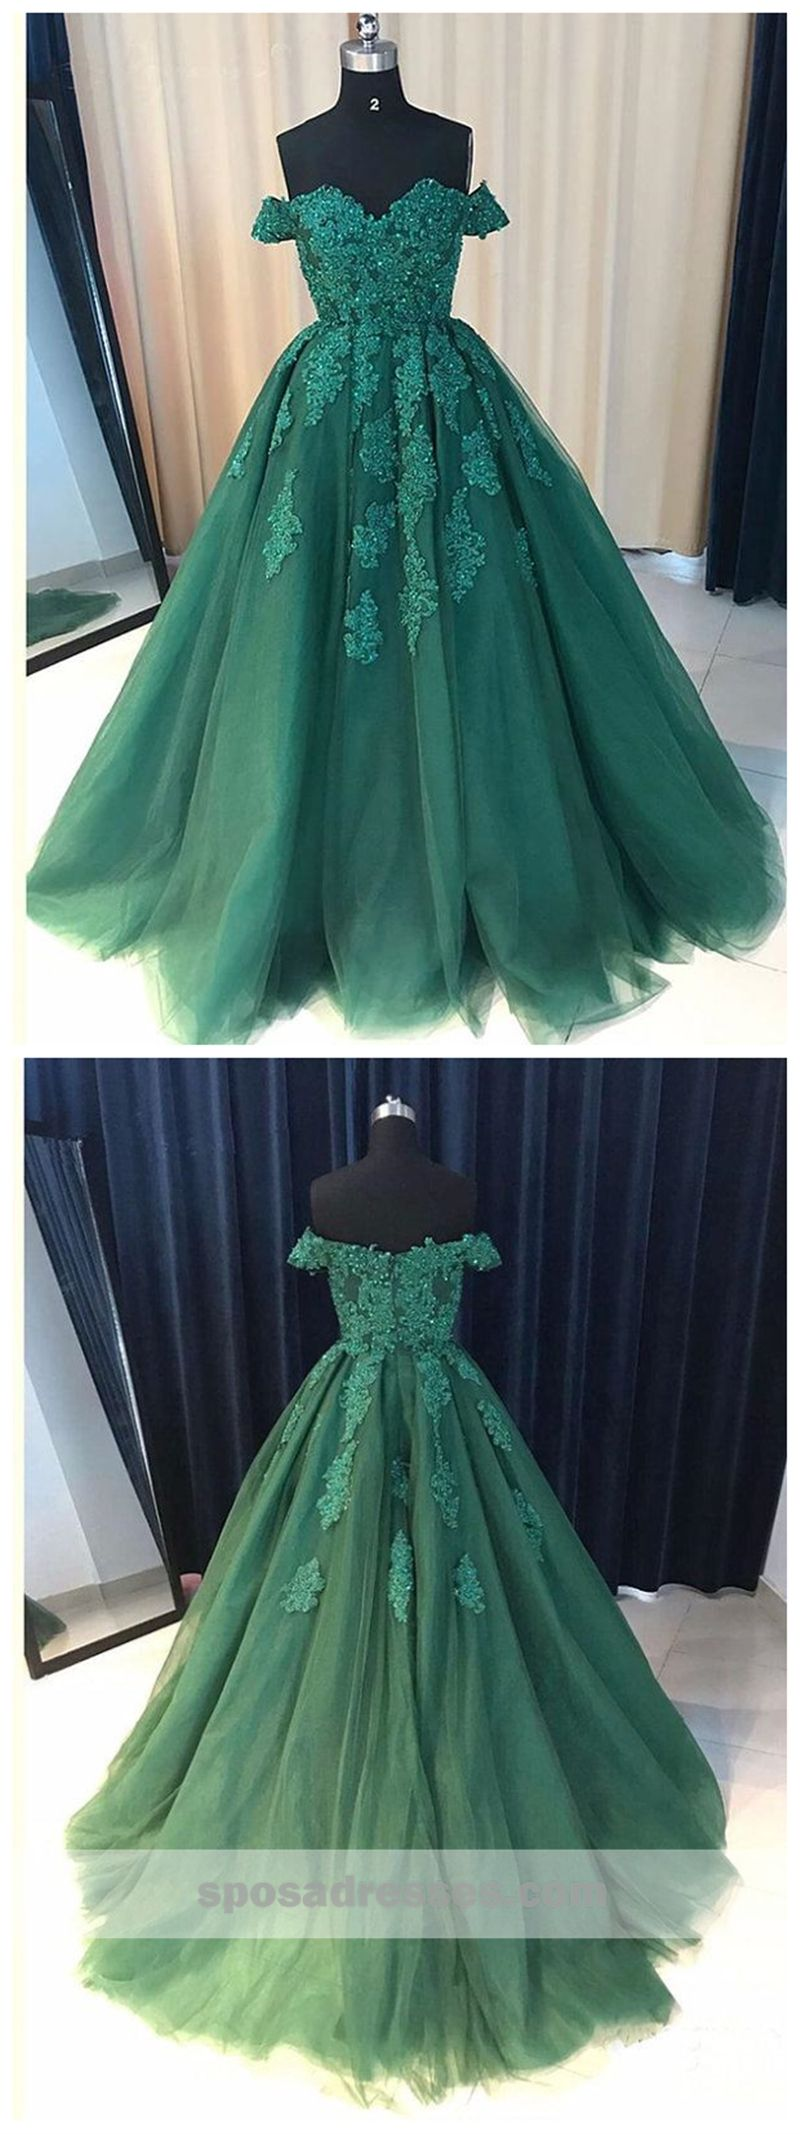 Off shoulder emerald green lace a line long custom evening prom